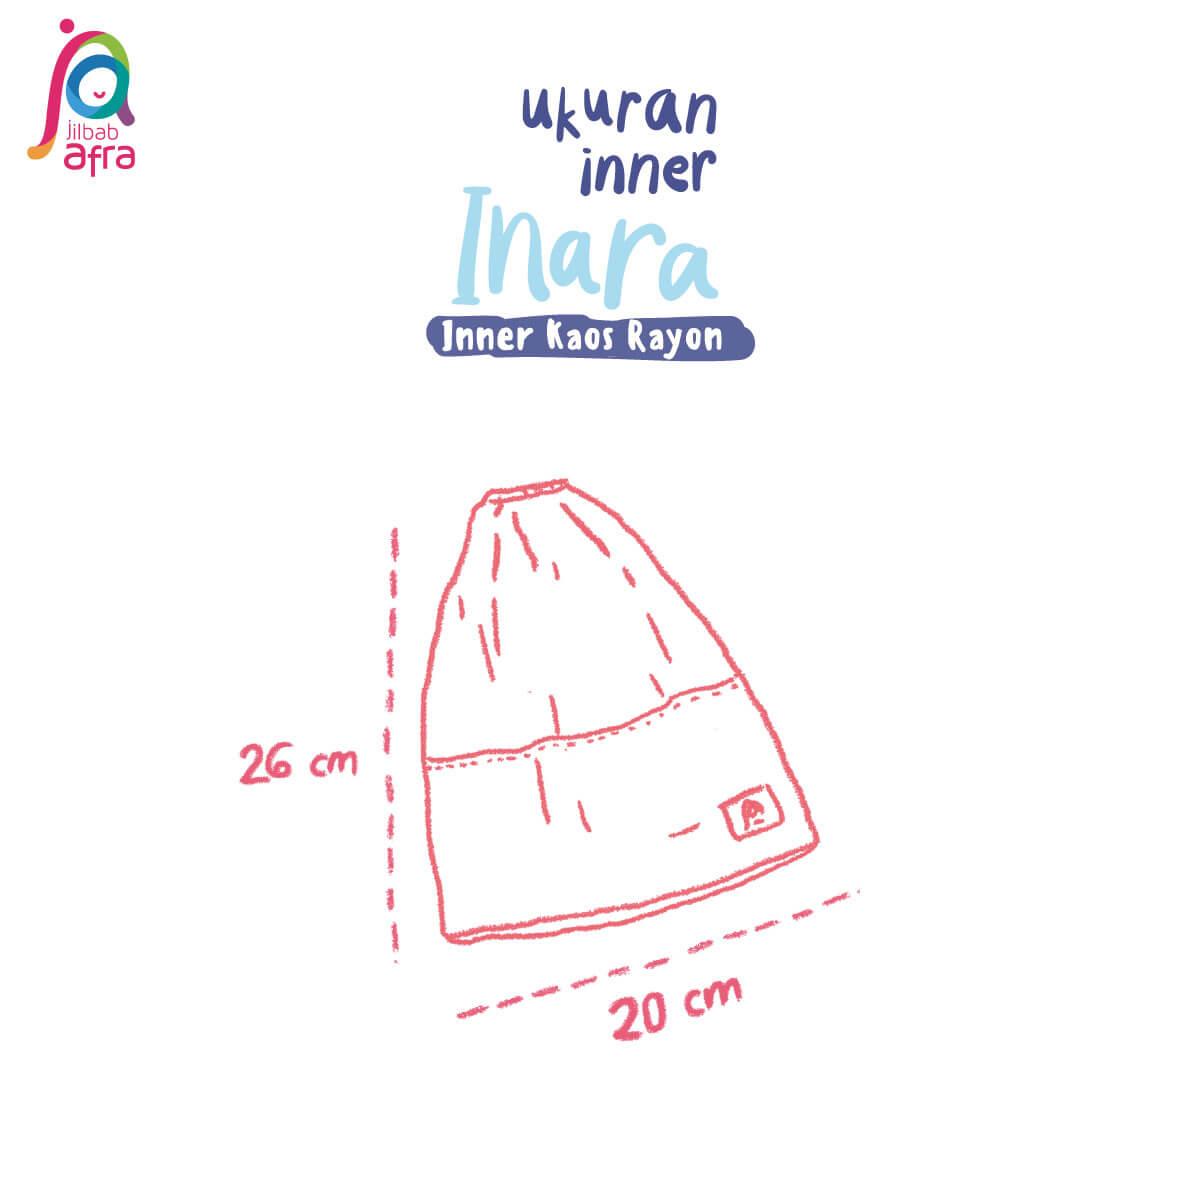 Ukuran Inner Inara